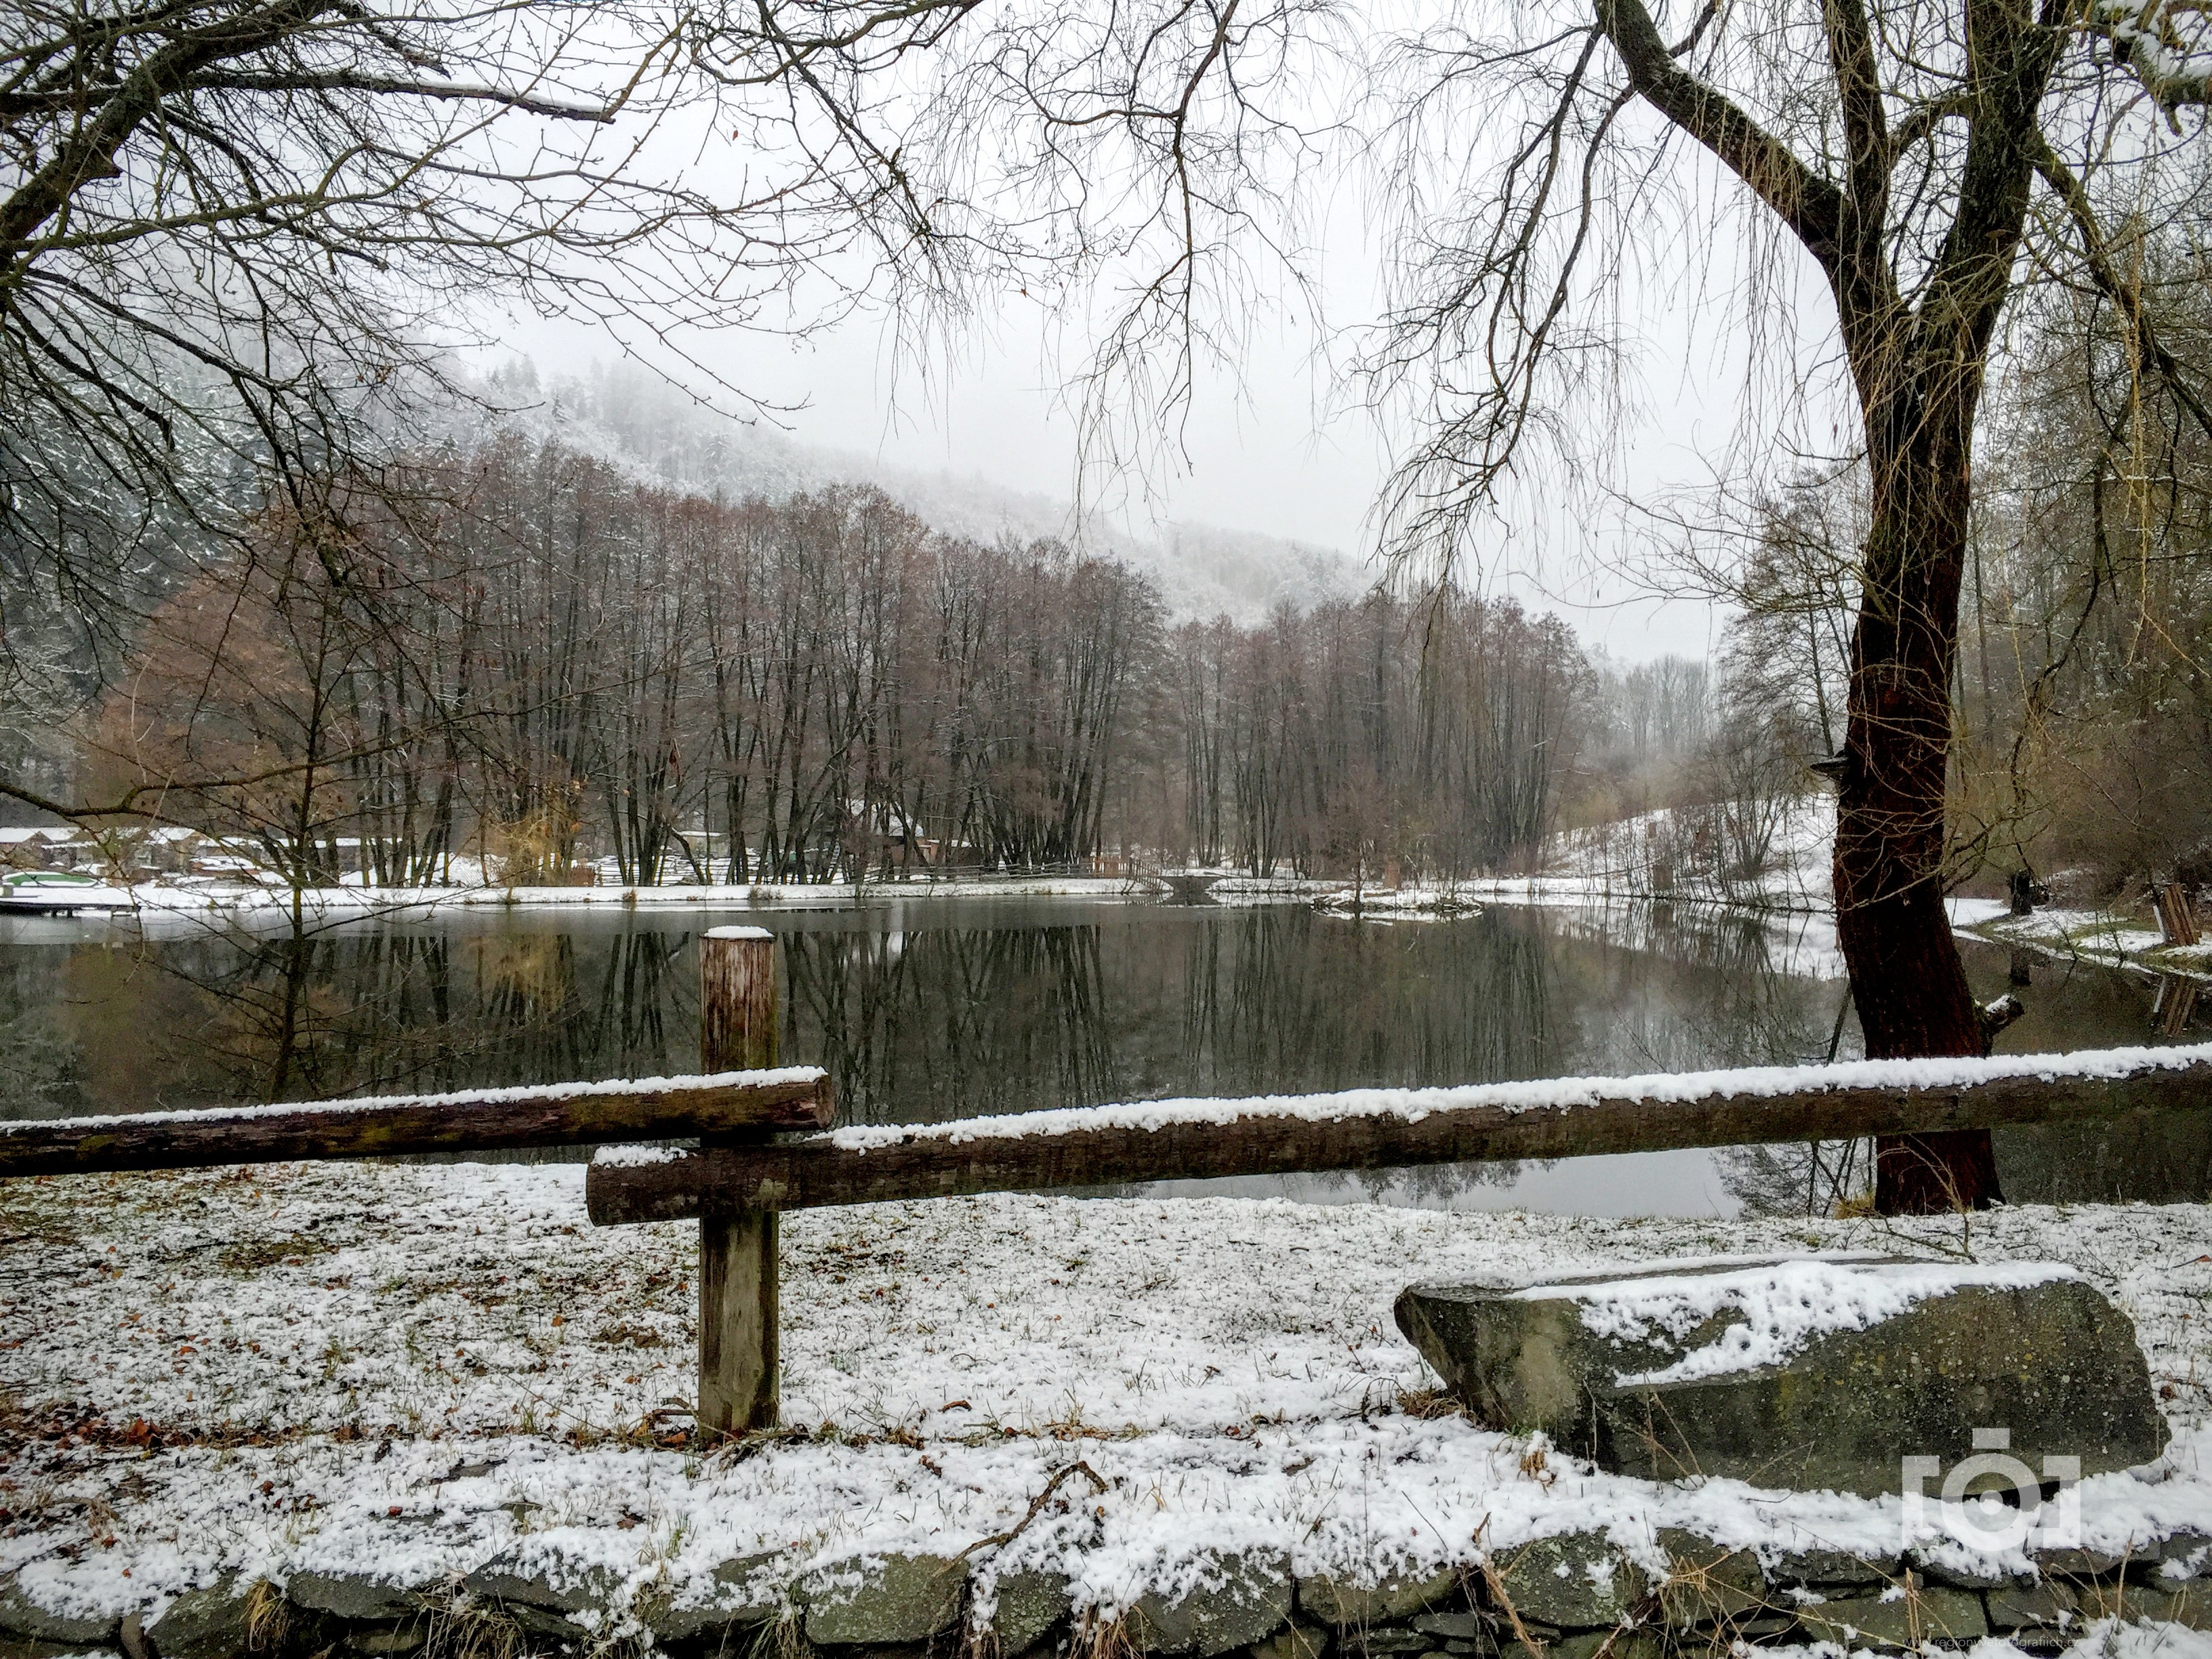 Melkovské údolí